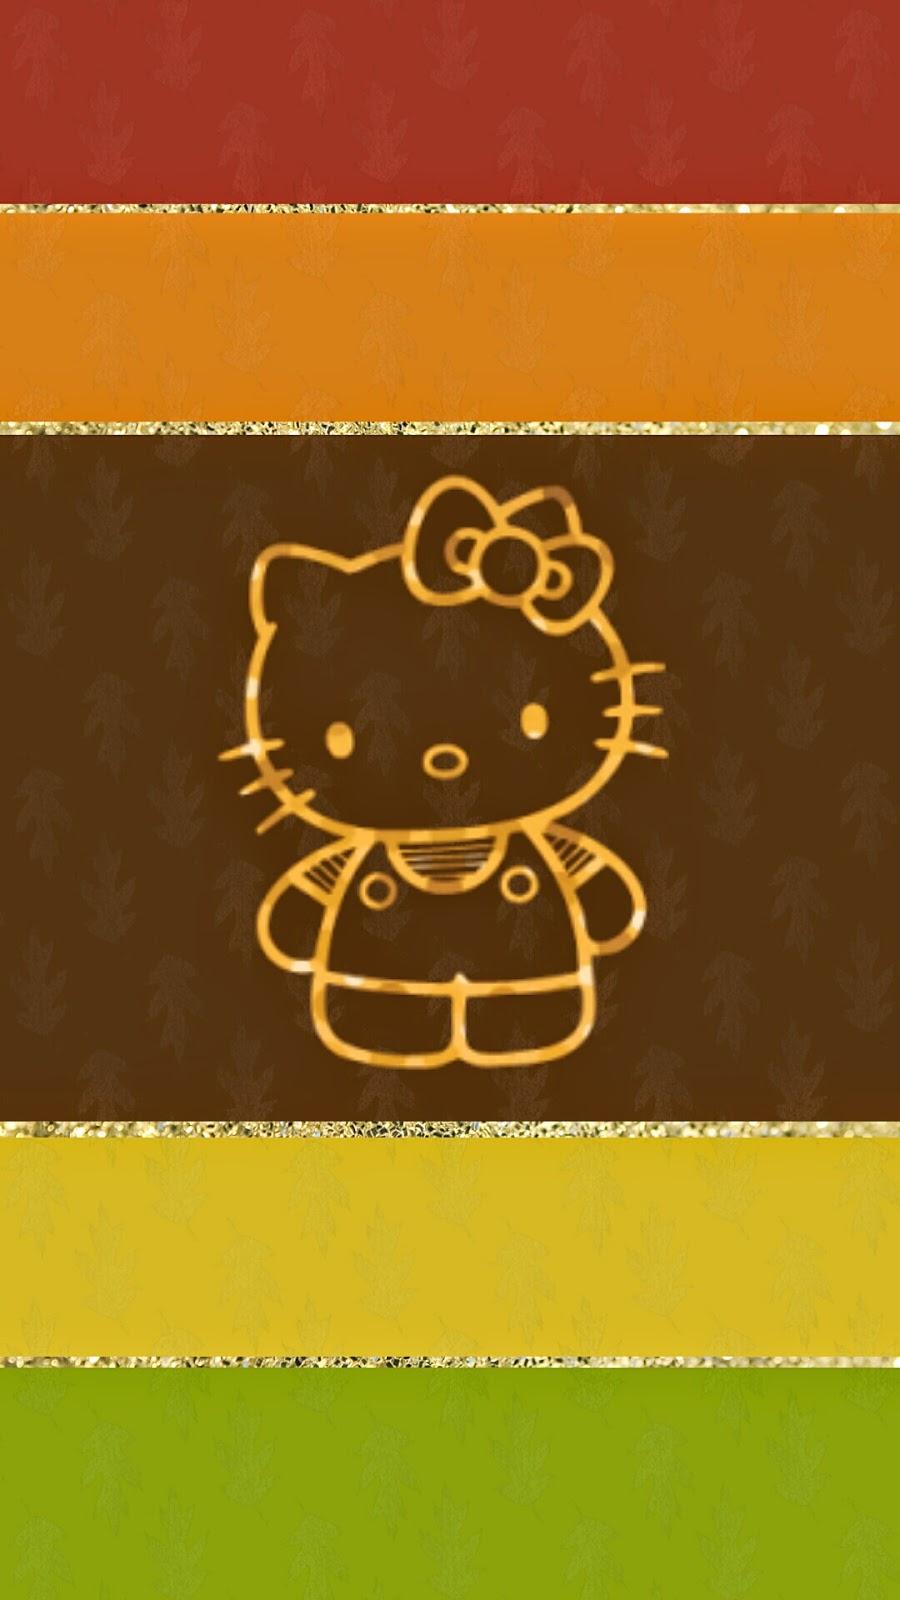 Top Wallpaper Hello Kitty Orange - NikkiBsDesignz-Hello-Kitty-Fall-Walls-wallpaper-wp5402856  Perfect Image Reference_754815.jpg